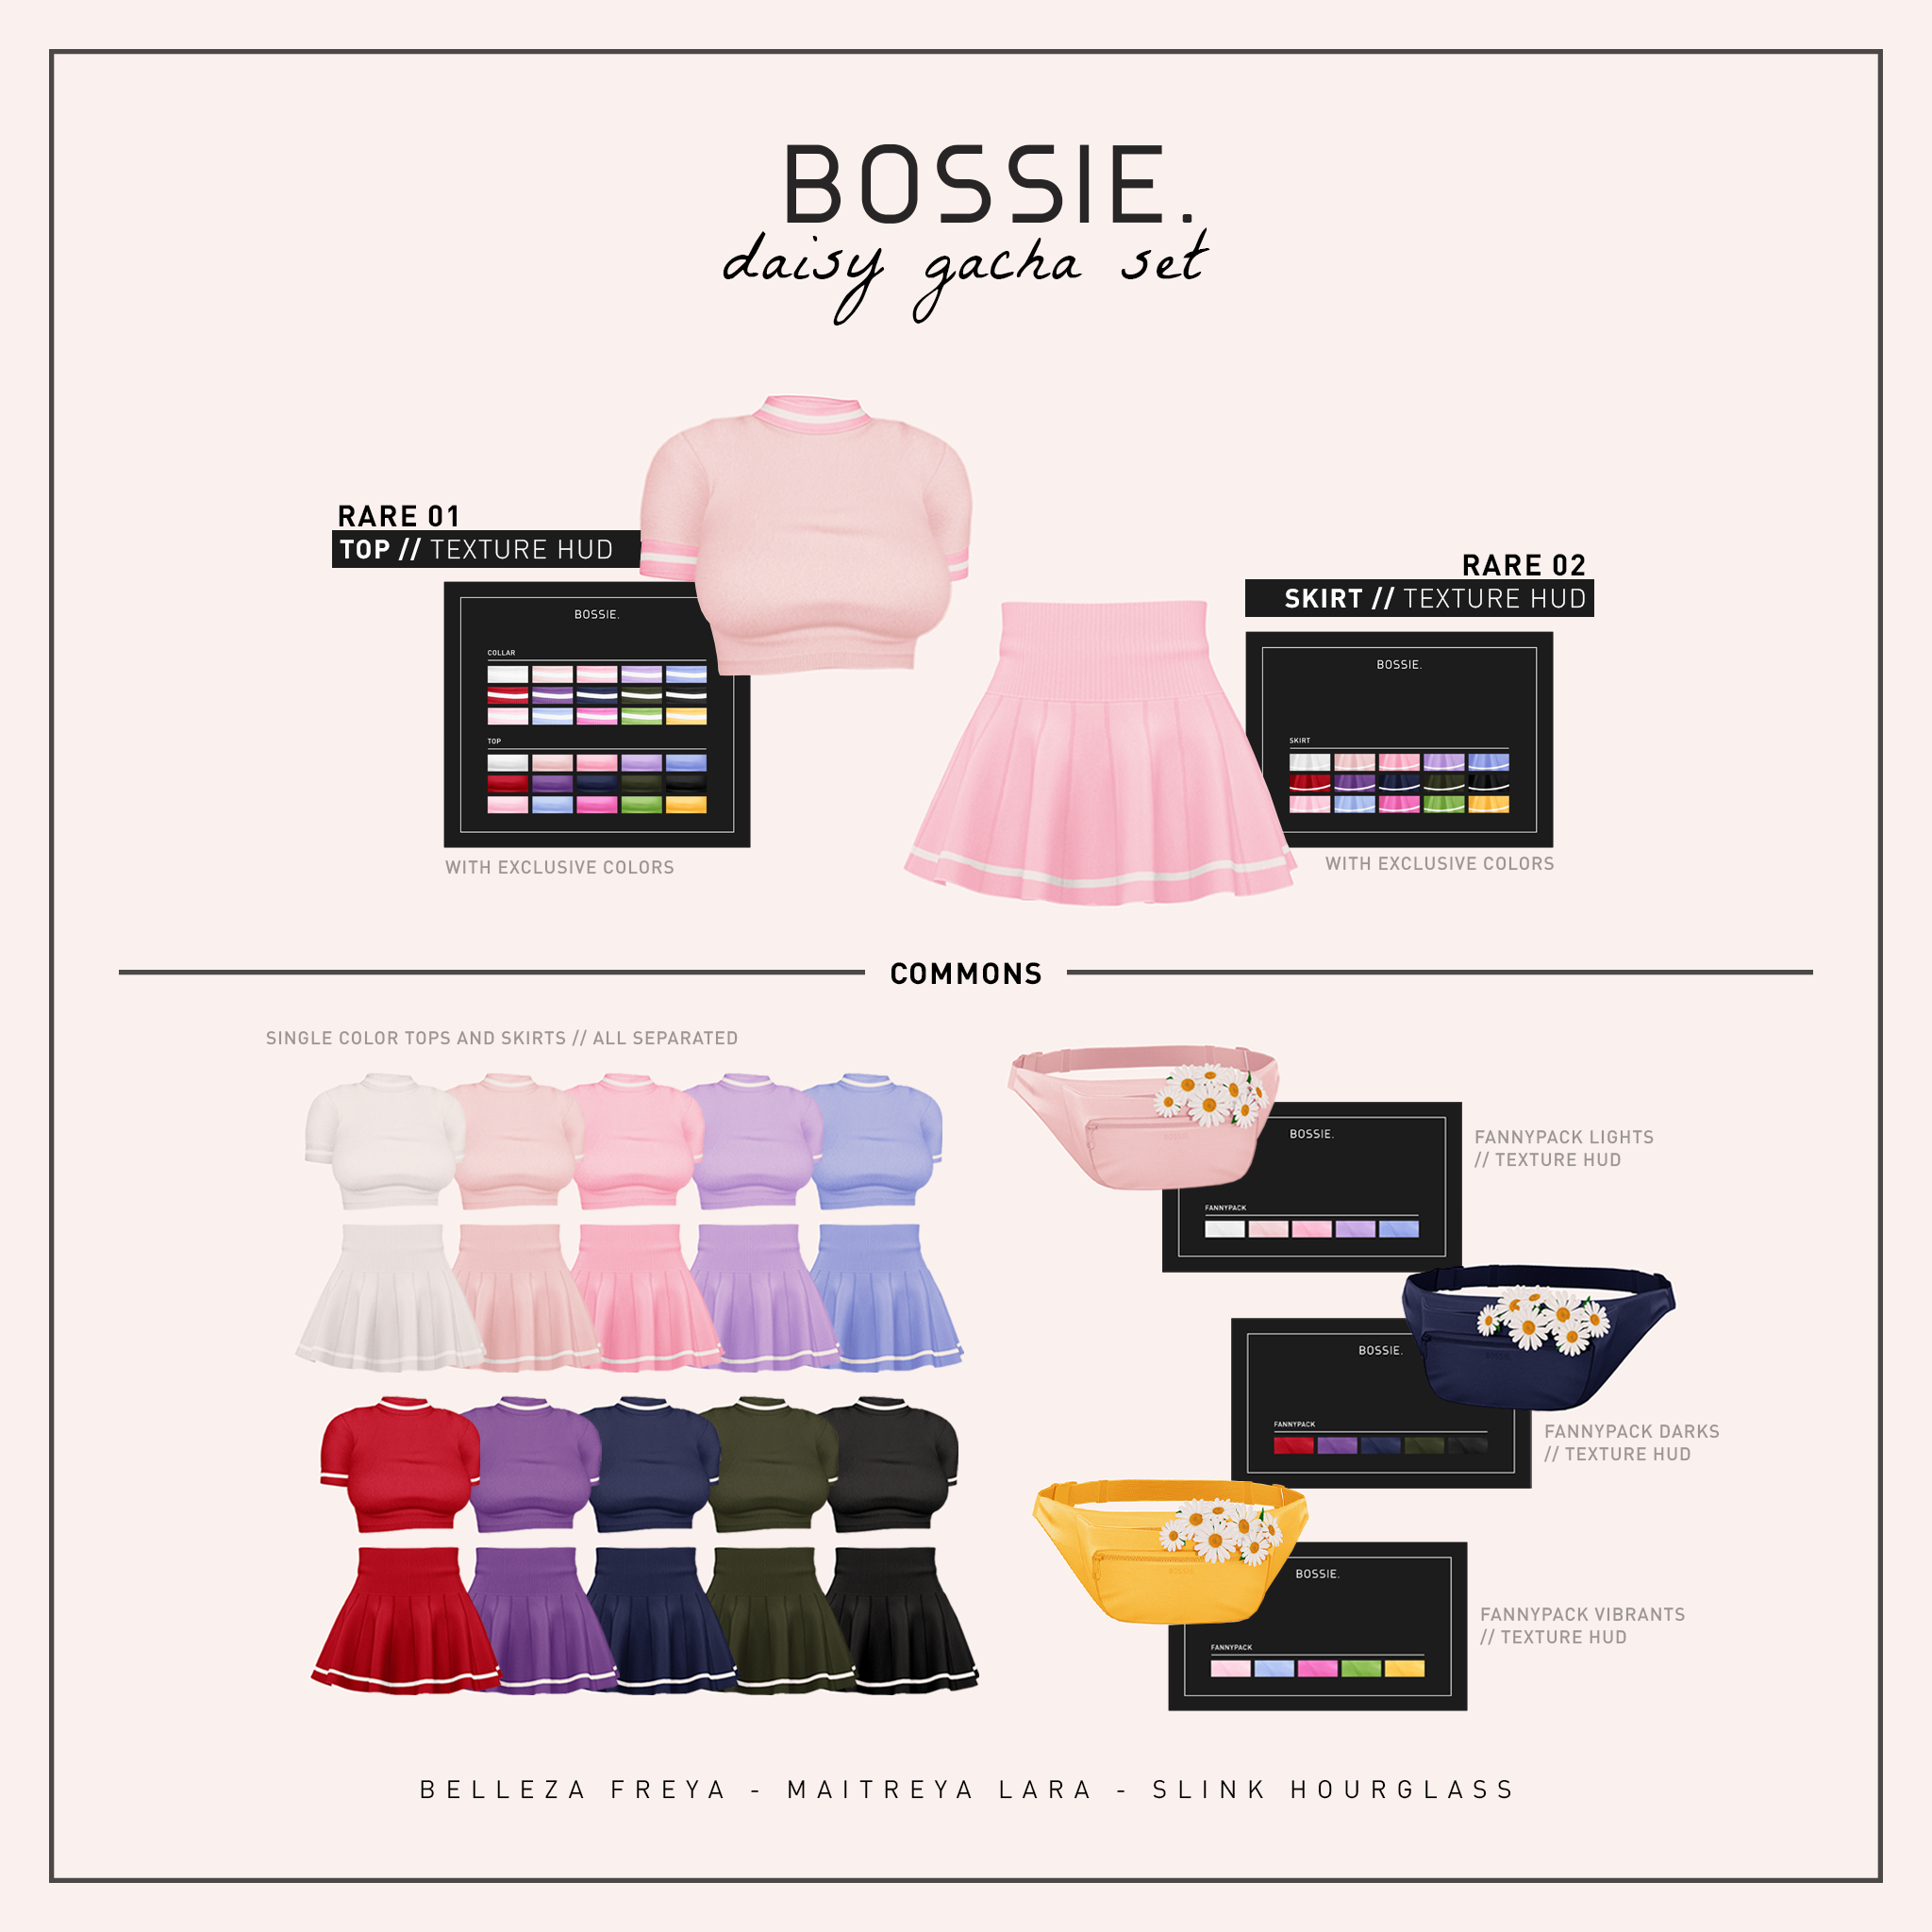 Bossie daisy gacha key.png